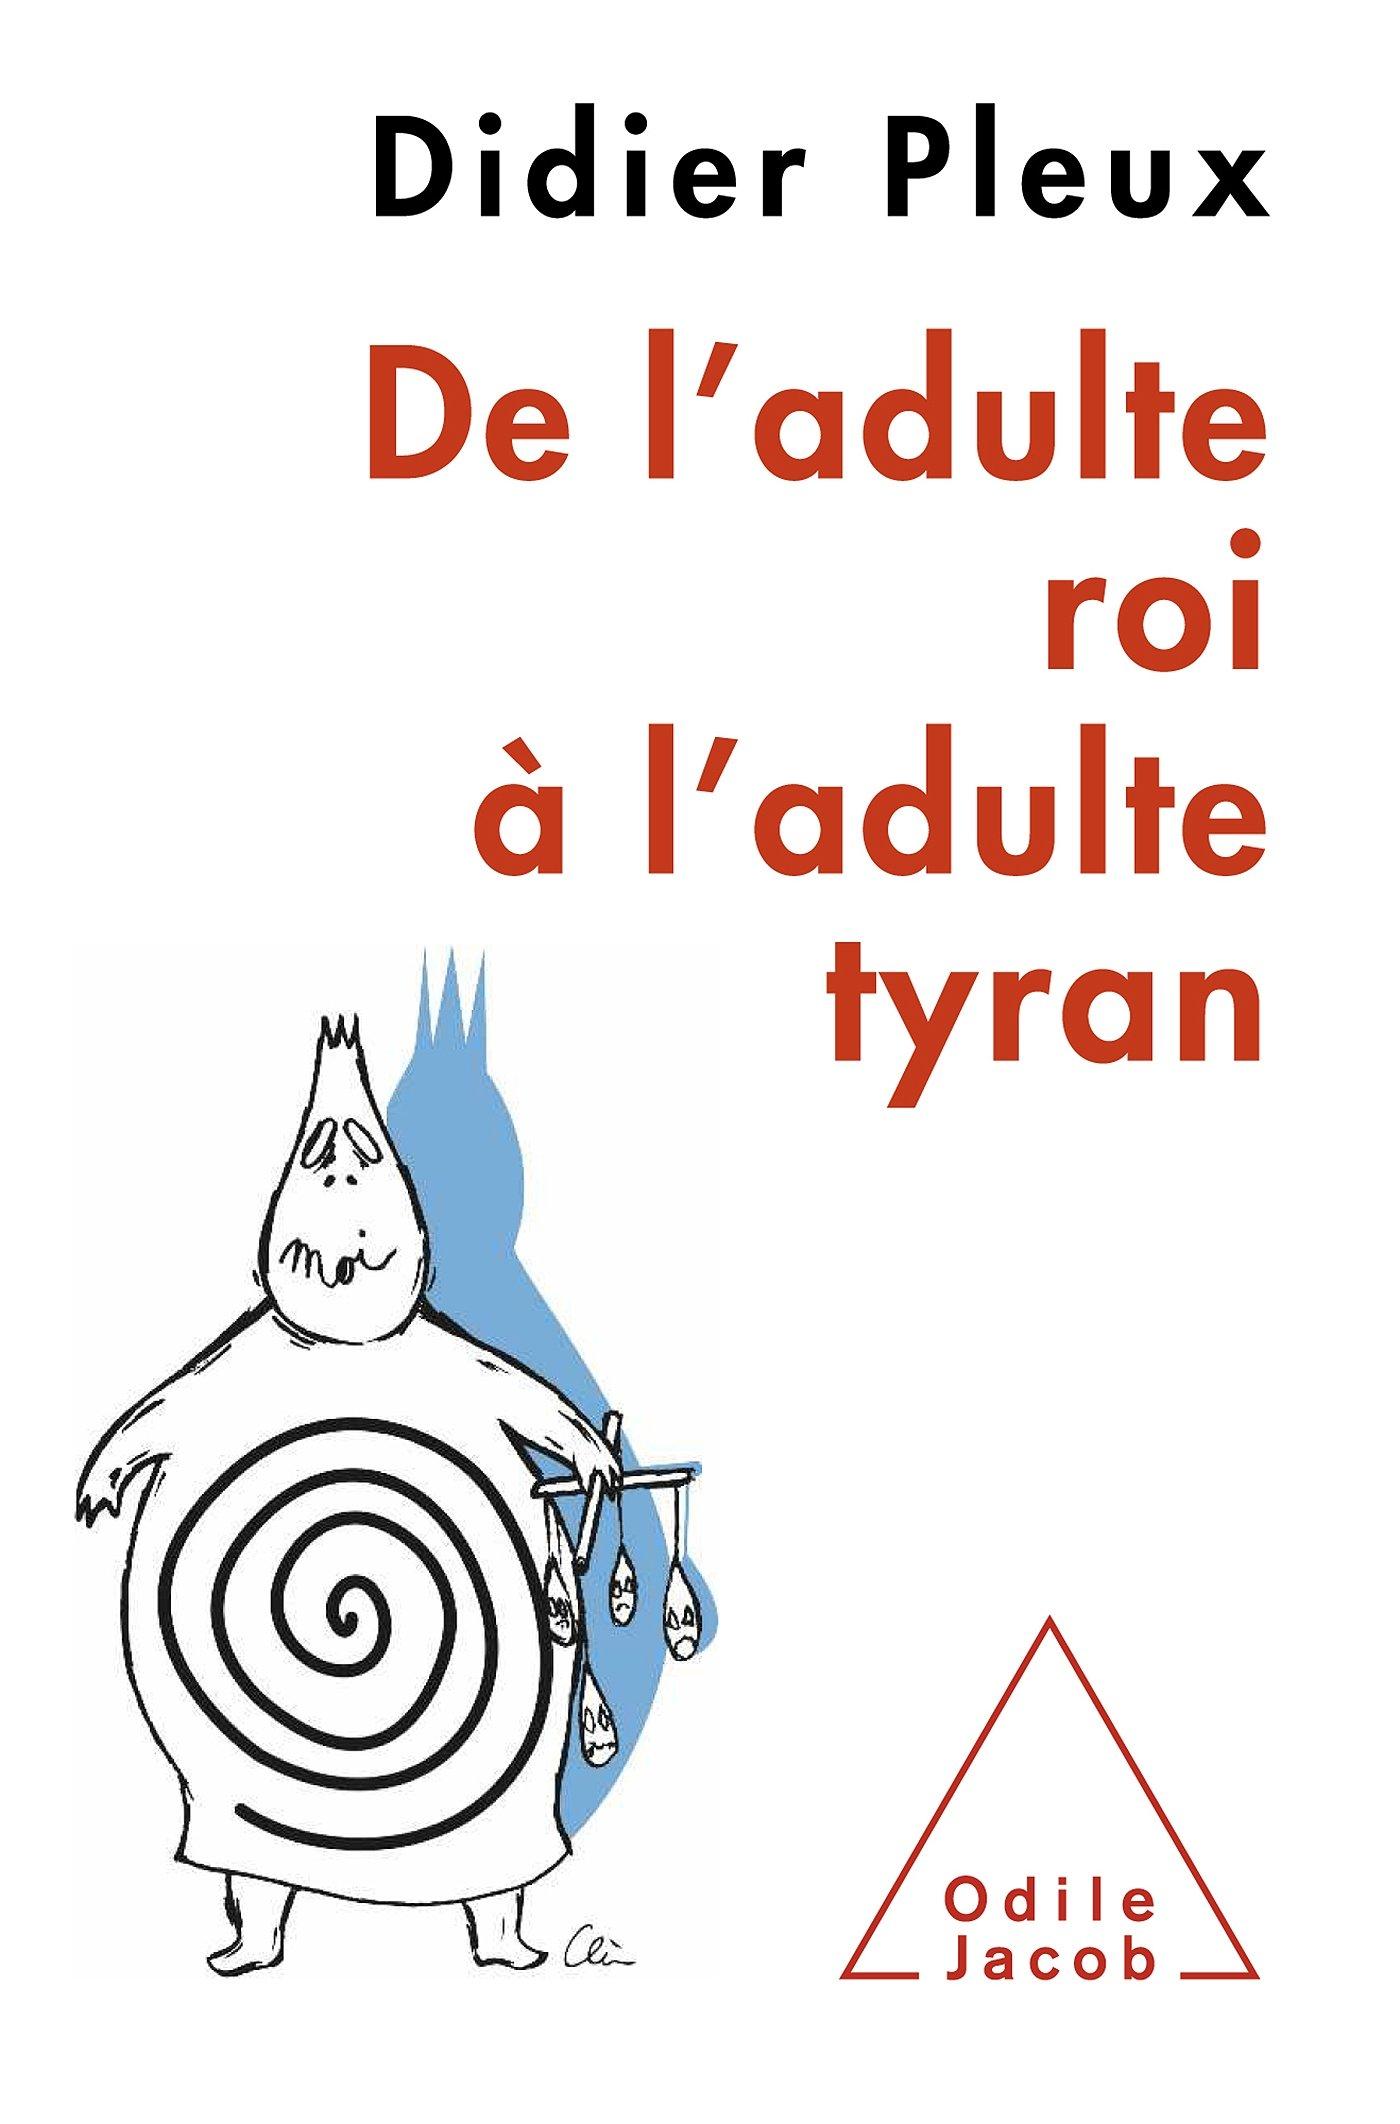 De ladulte roi à ladulte tyran (OJ.PSYCHOLOGIE): Amazon.es: Didier Pleux: Libros en idiomas extranjeros